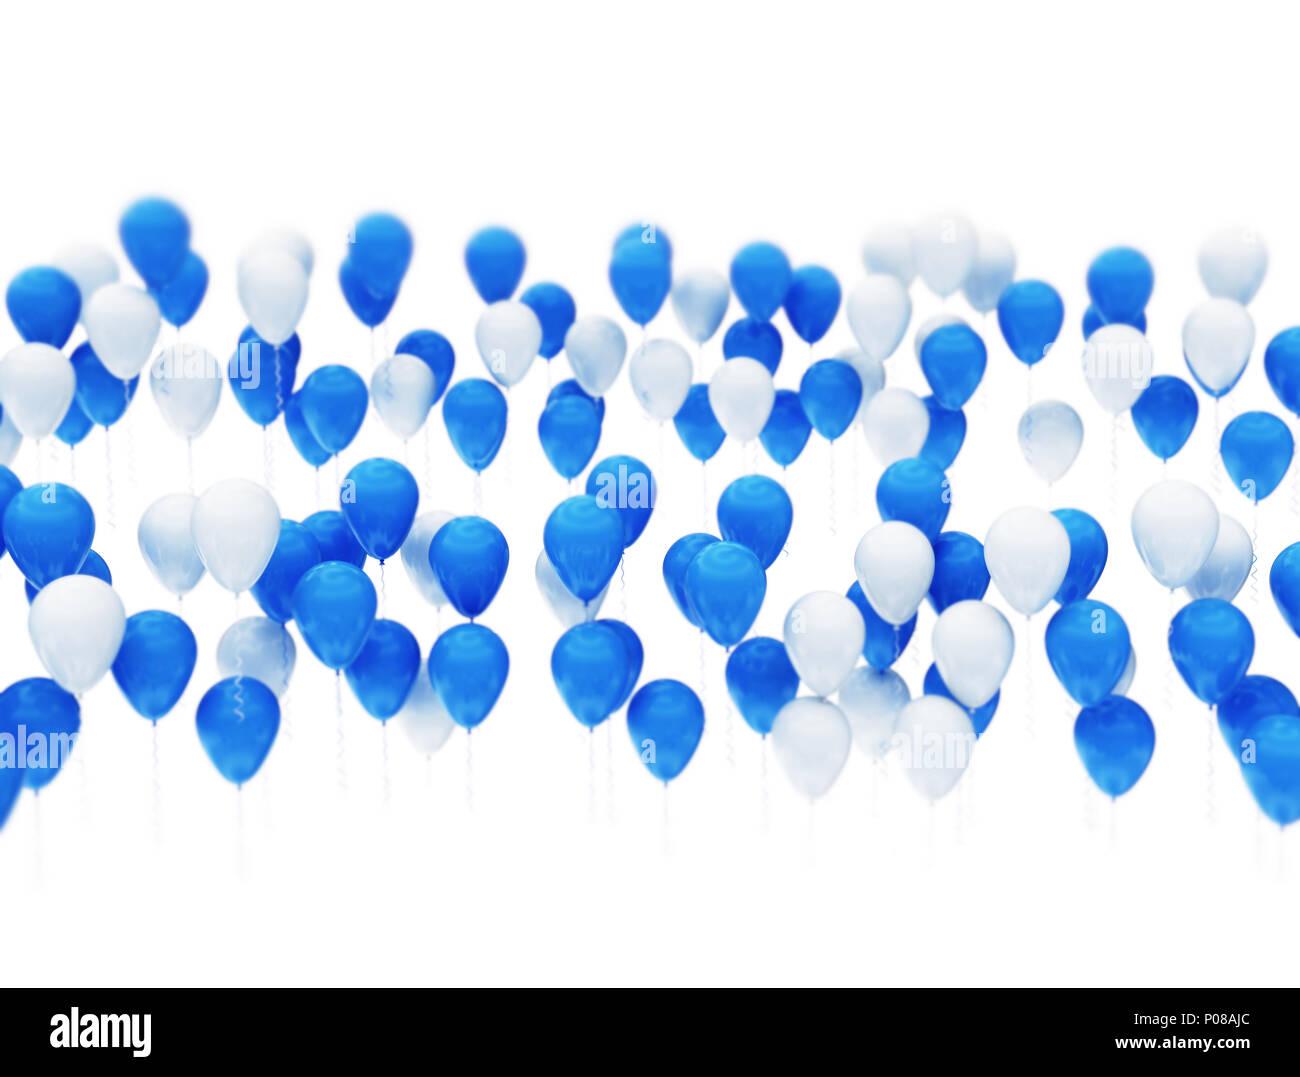 Celebrating Air Space Shiny Light Blue Image Stock Photos